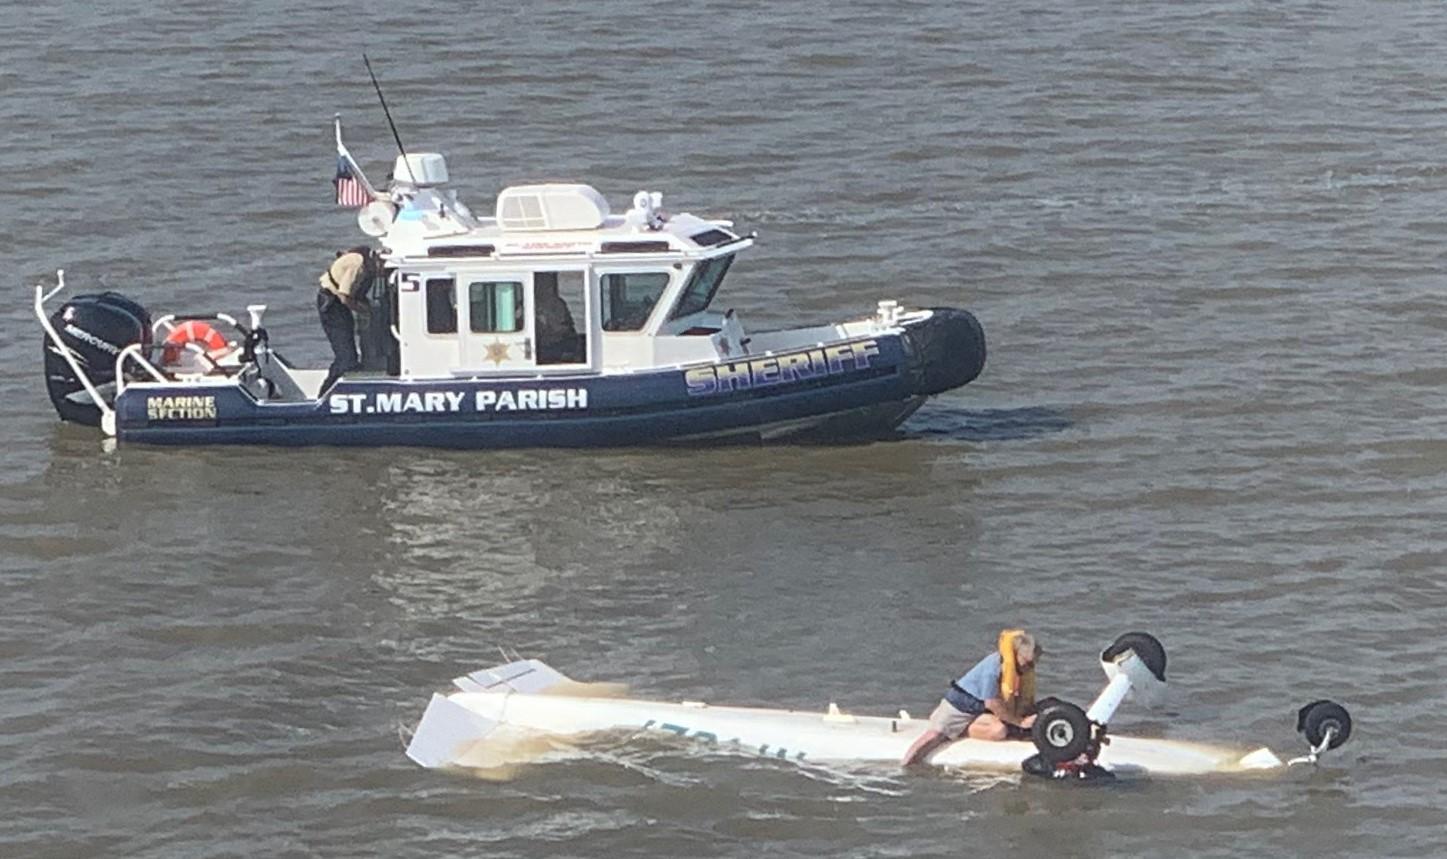 https://wgno.com/news/louisiana/coast-guard-pulls-pilot-from-wreckage-in-waters-south-of-morgan-city